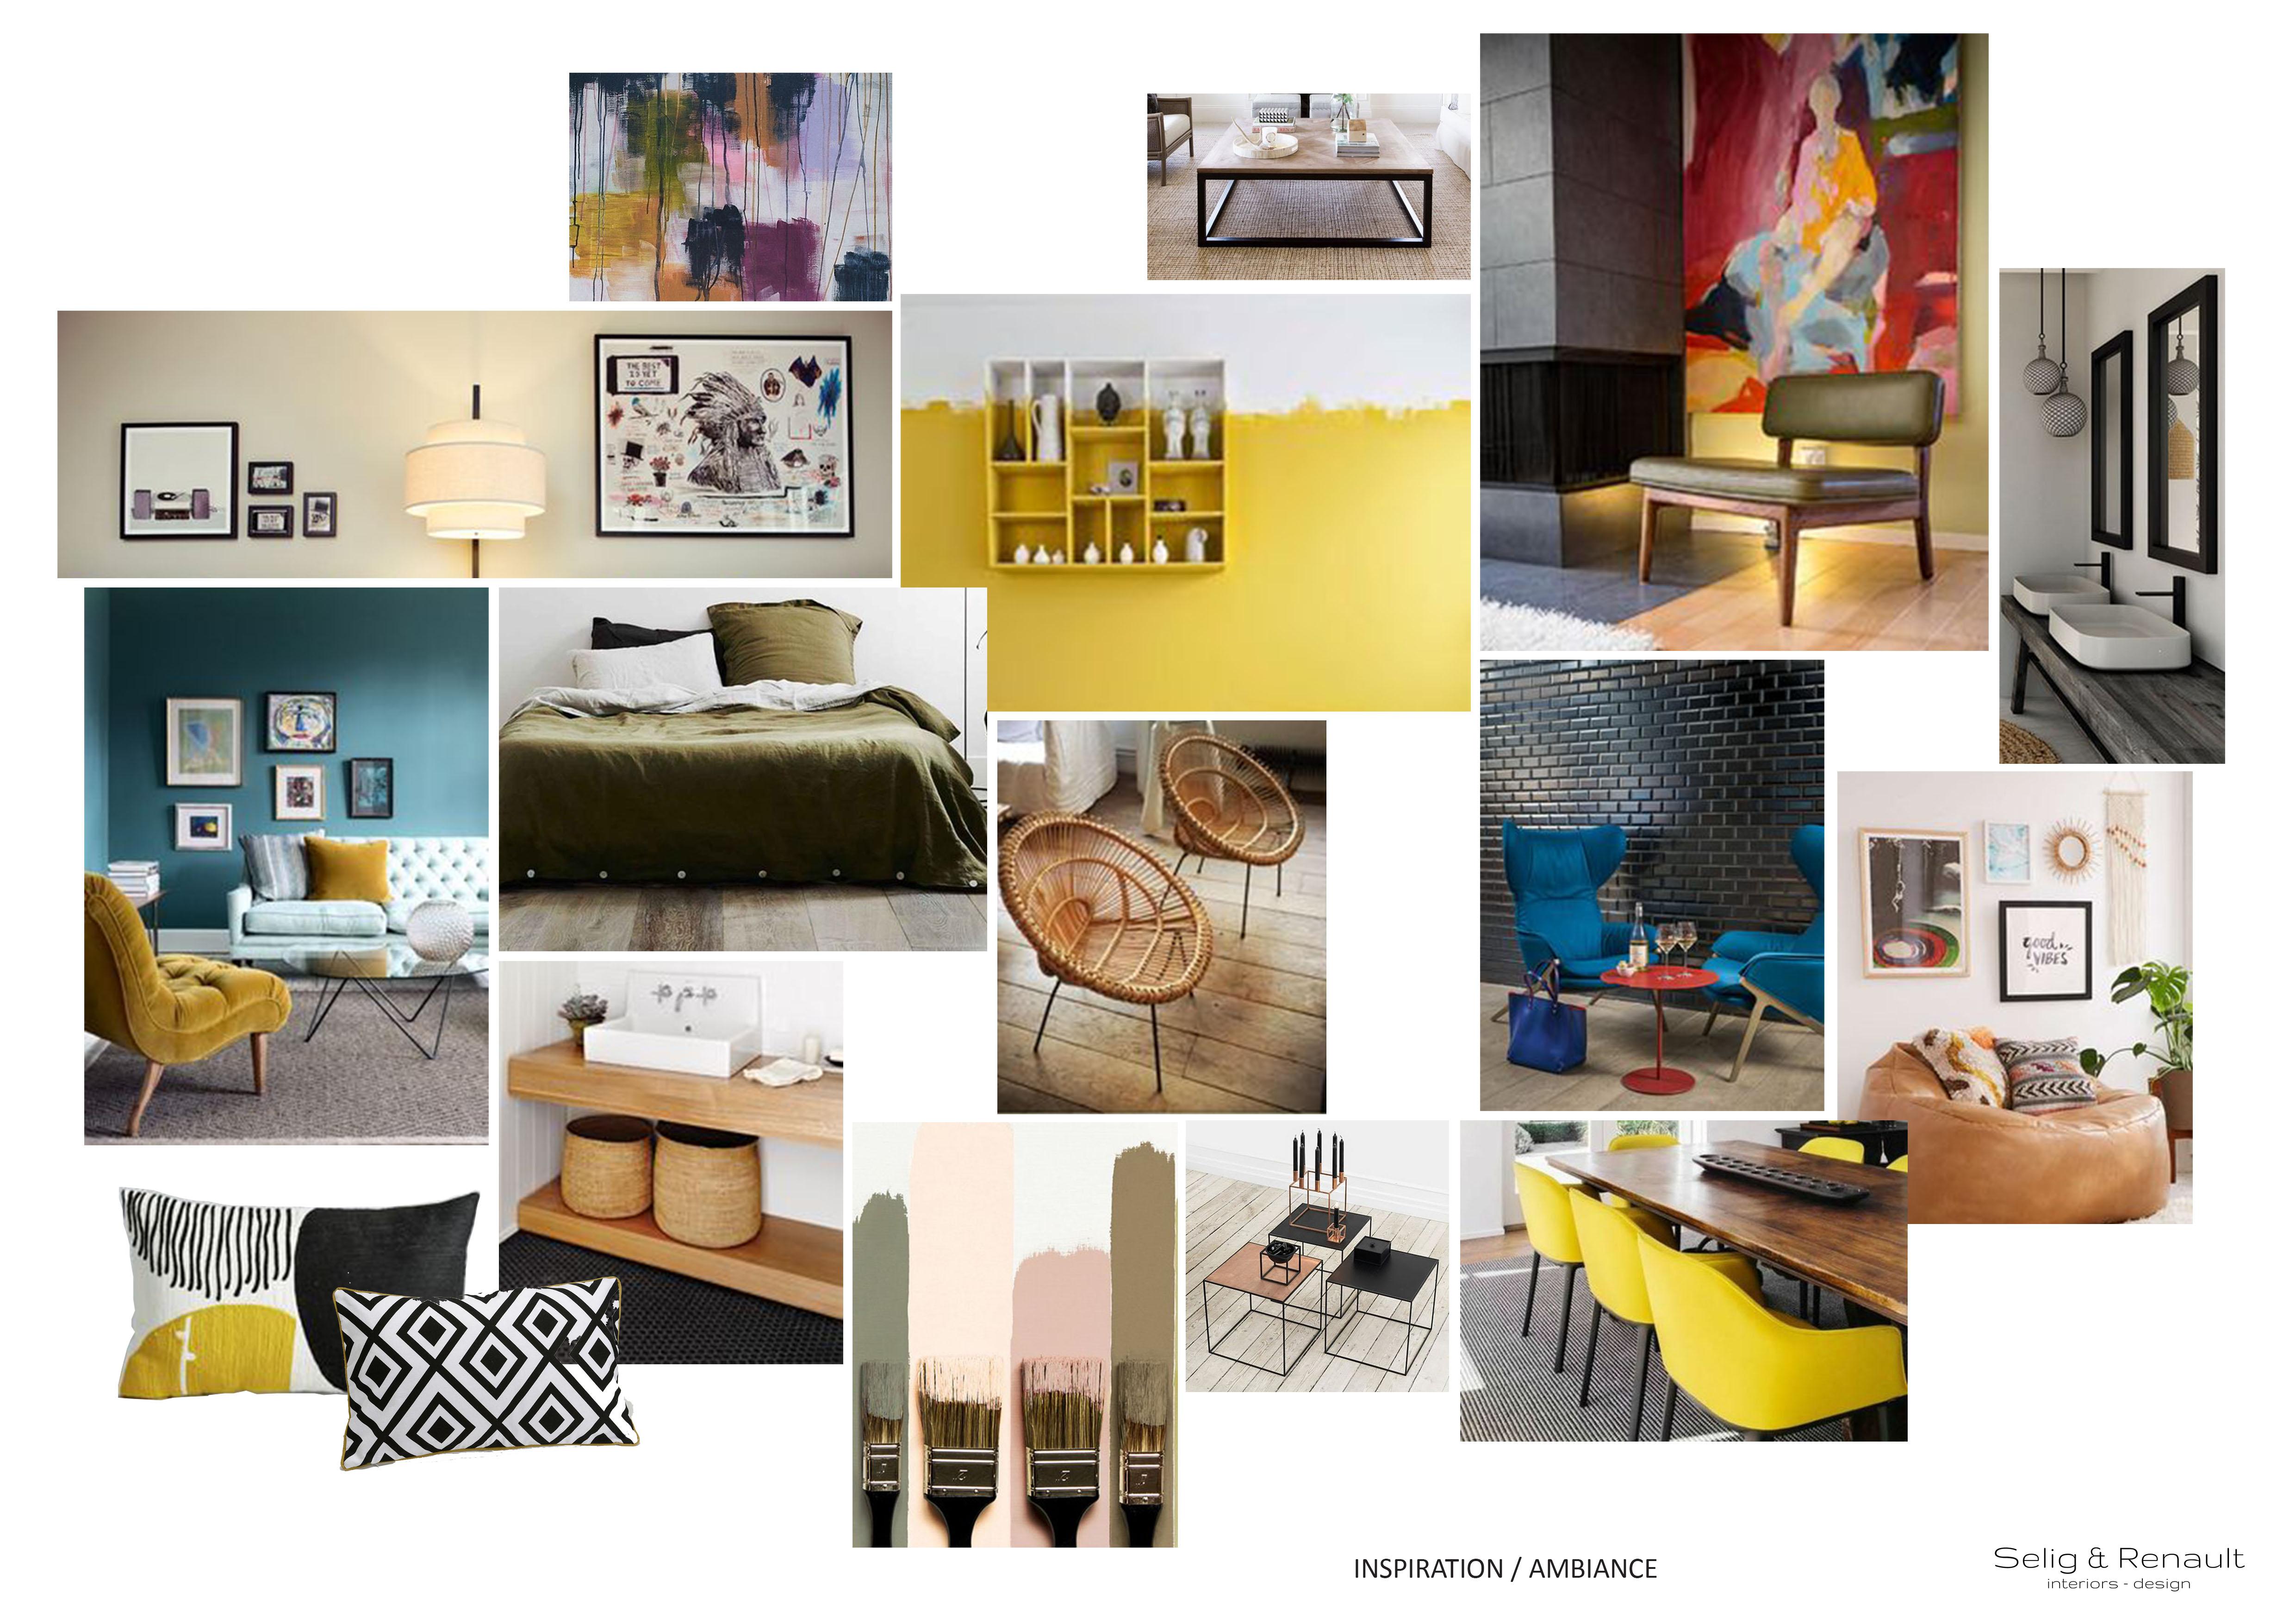 Interior Design Agency French Decorateur Paris I Selig Renault